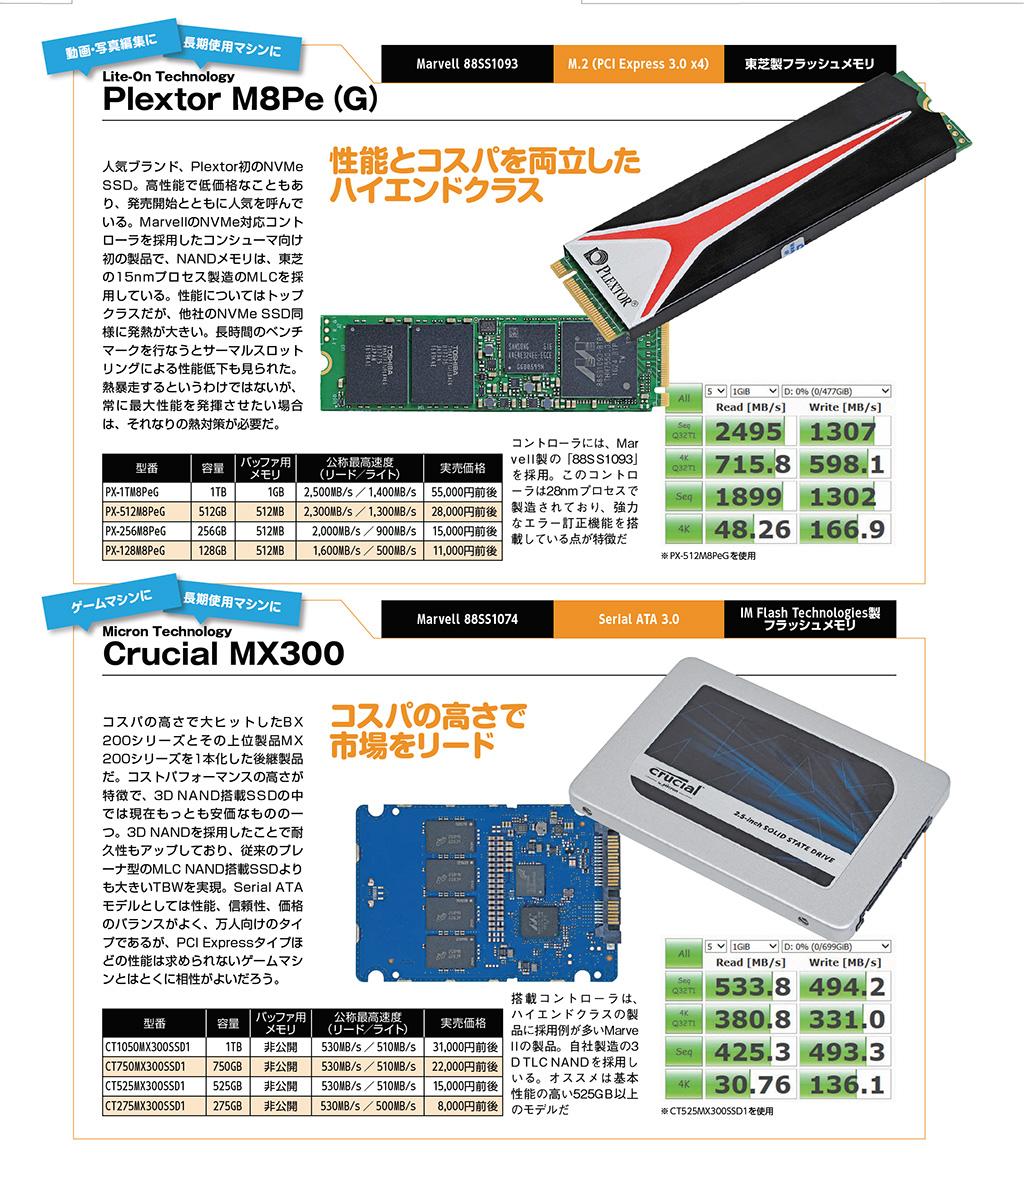 Lite-On Technology Plextor M8Pe(G) / Micron Technology Crucial MX300